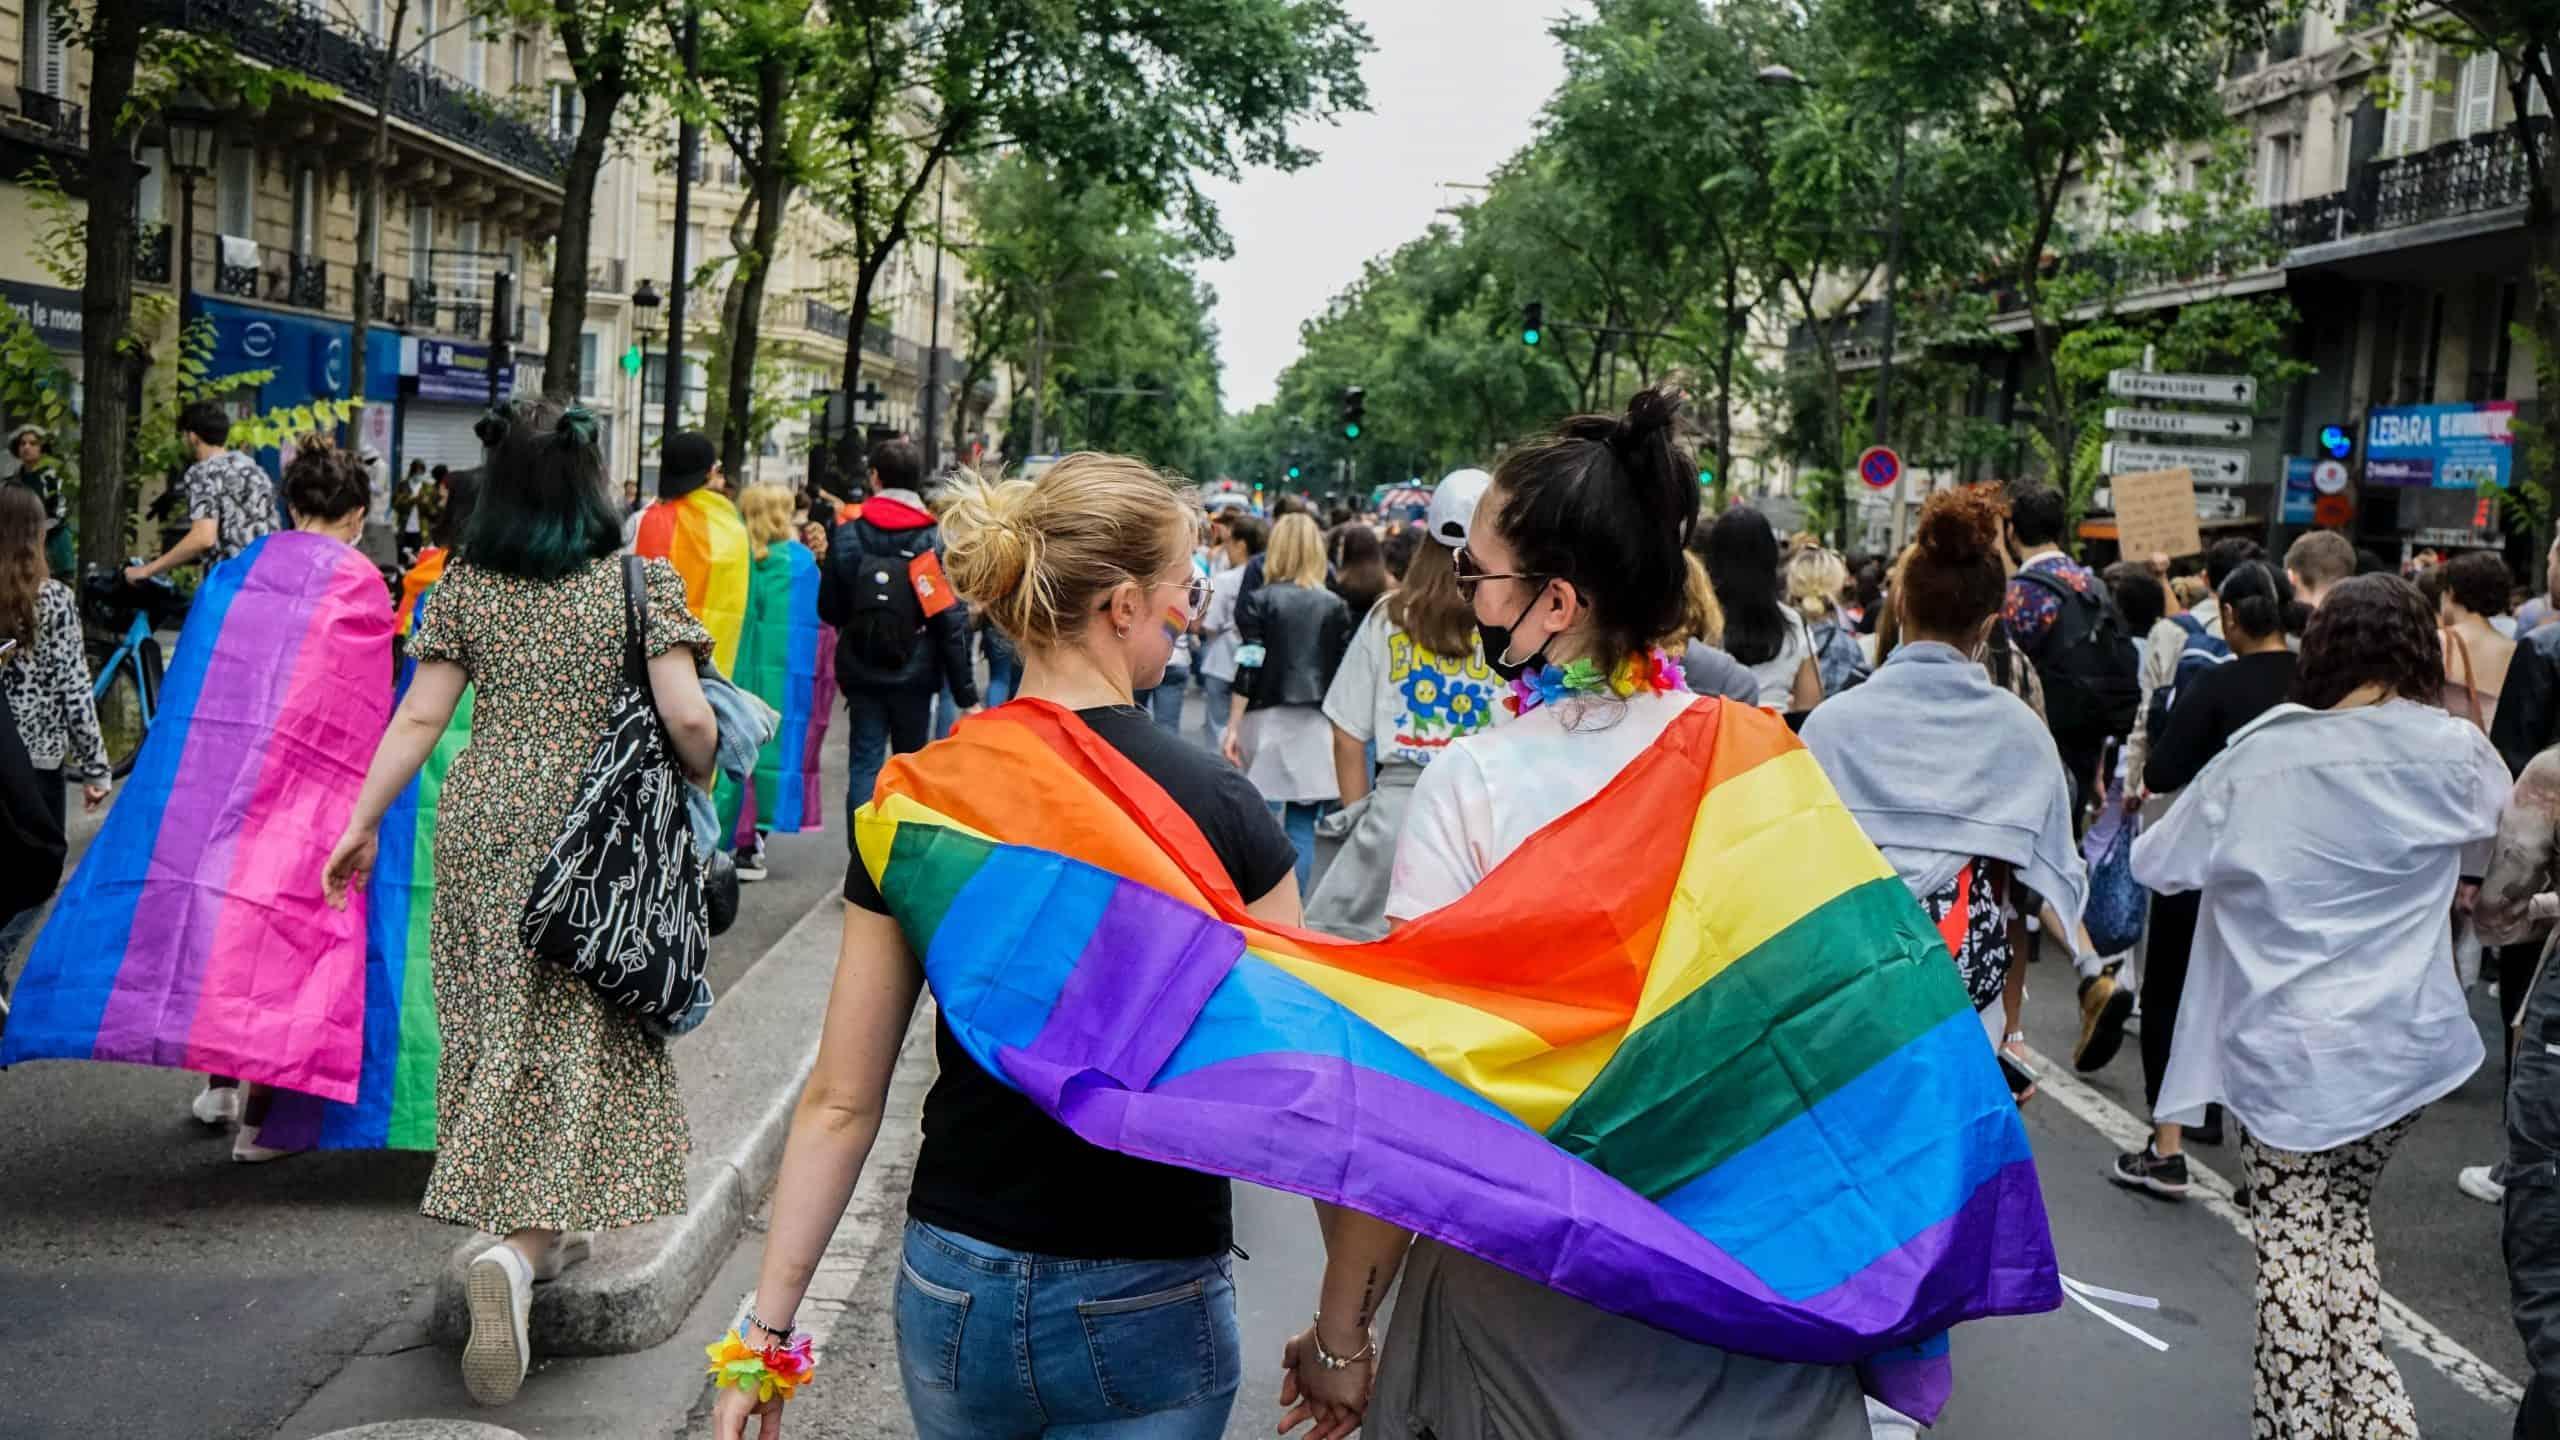 Lesbian couple walking with a rainbow flag.